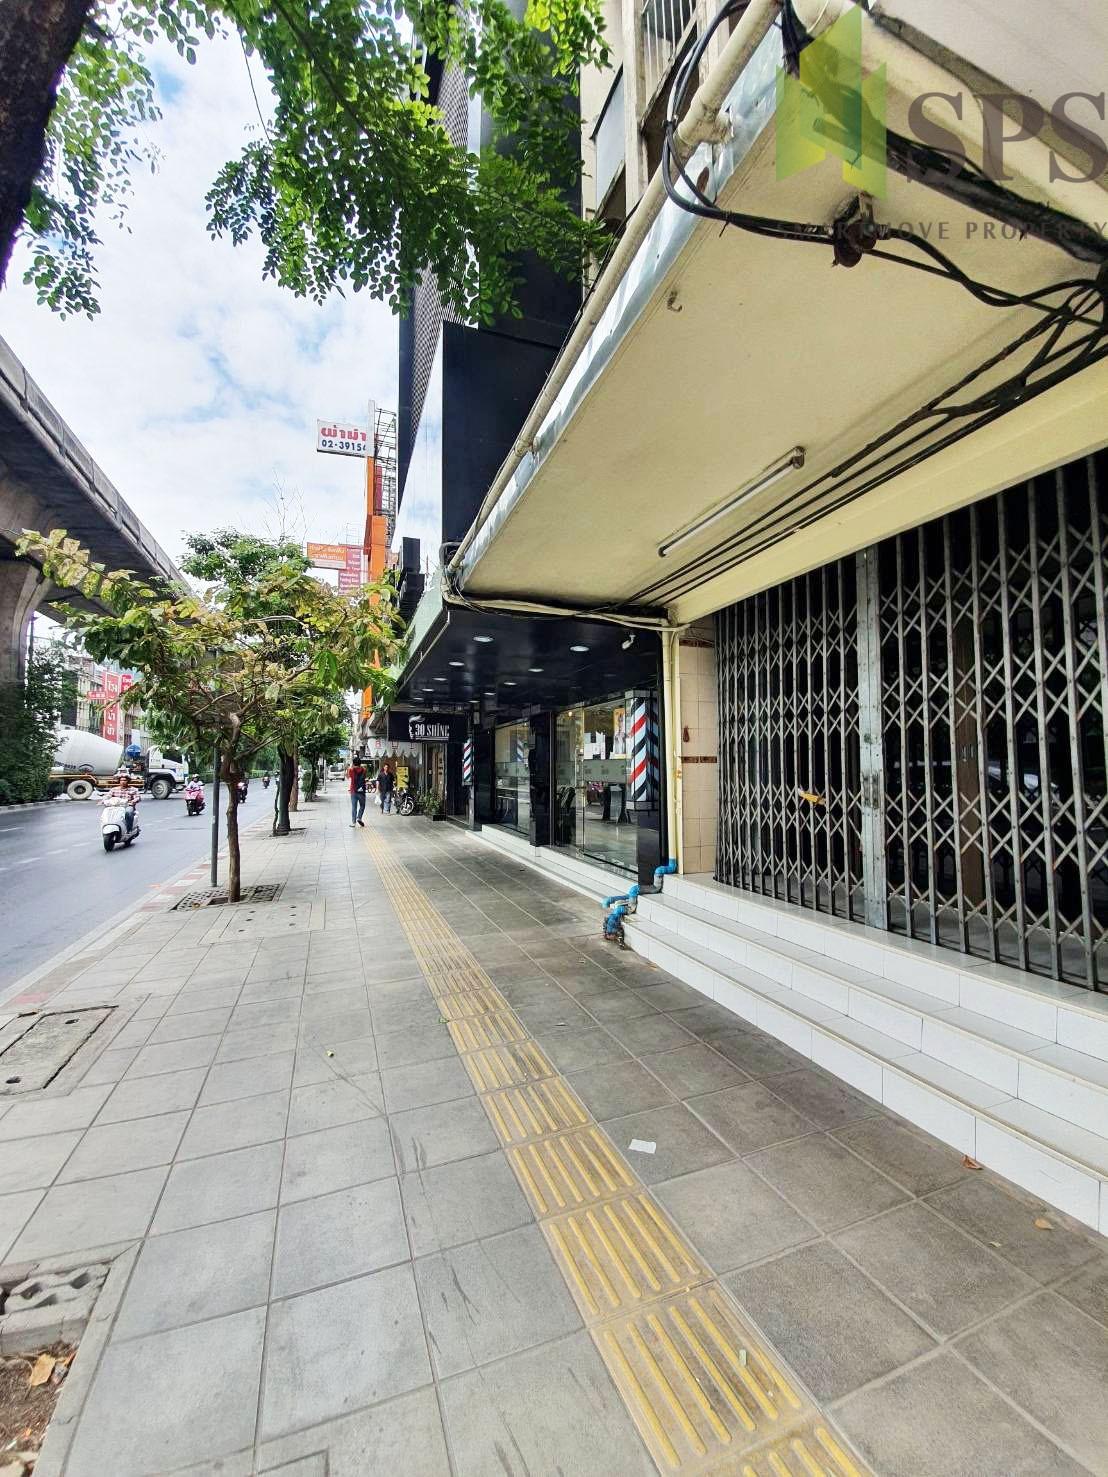 Space for Rent near BTS Phra Khanong พื้นที่ให้เช่า ใกล้บีทีเอส พระโขนง(SPS P261)